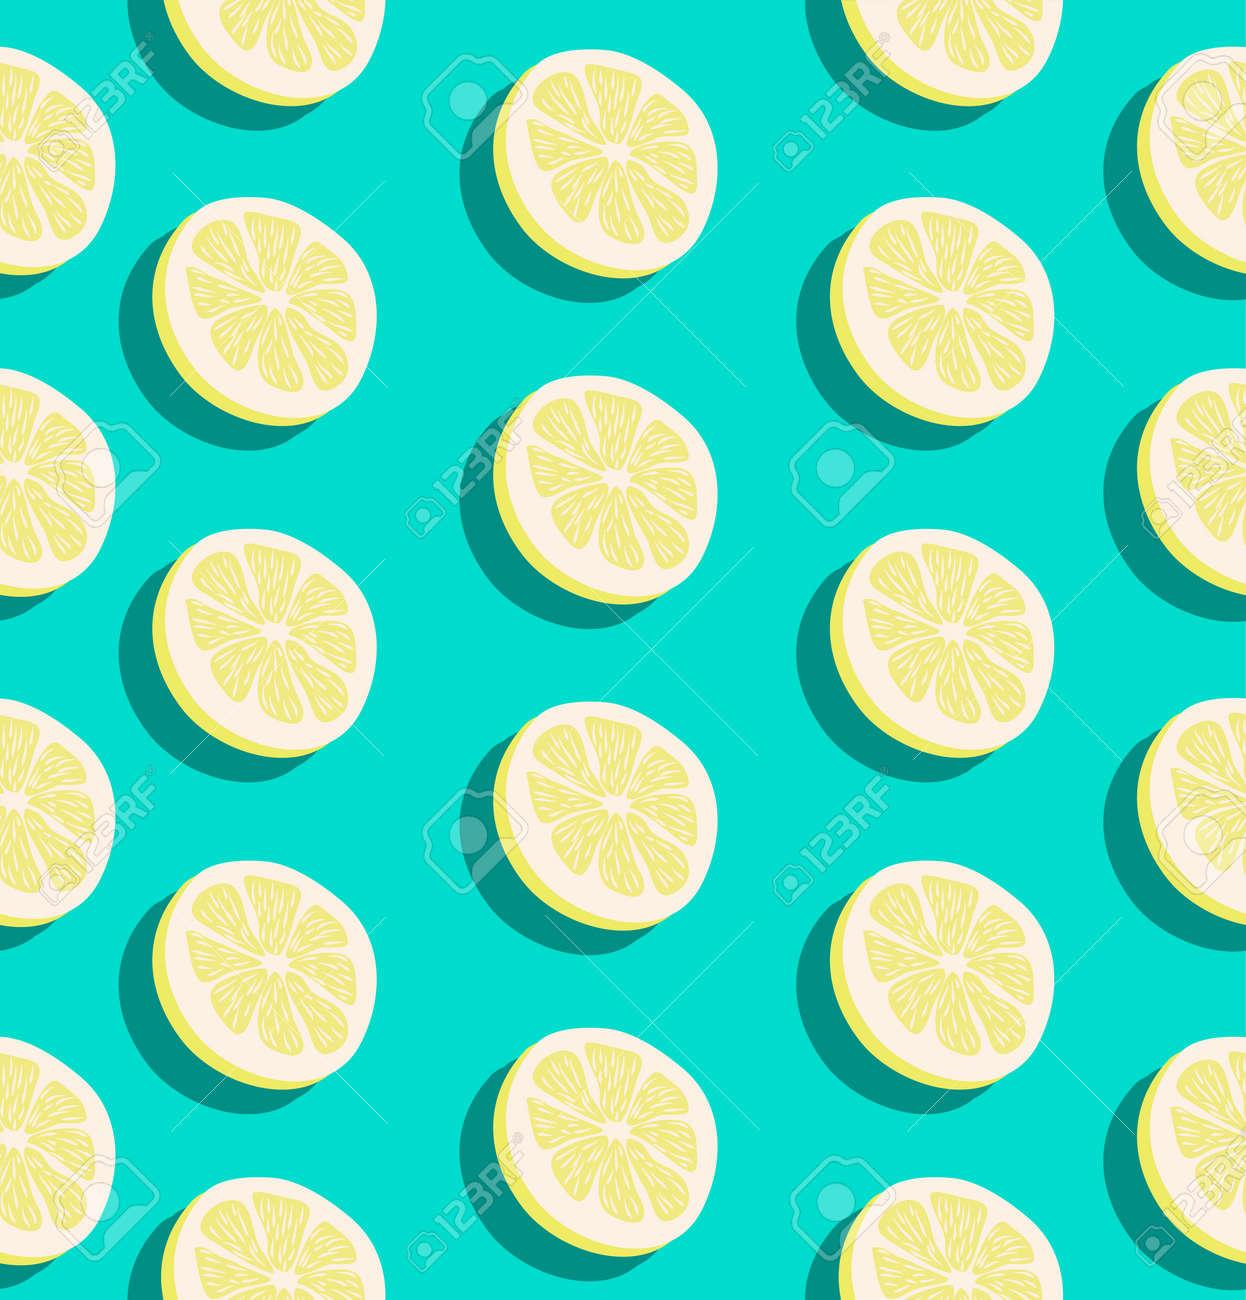 Summer slice of a lemon fruits seamless pattern background - 154269603